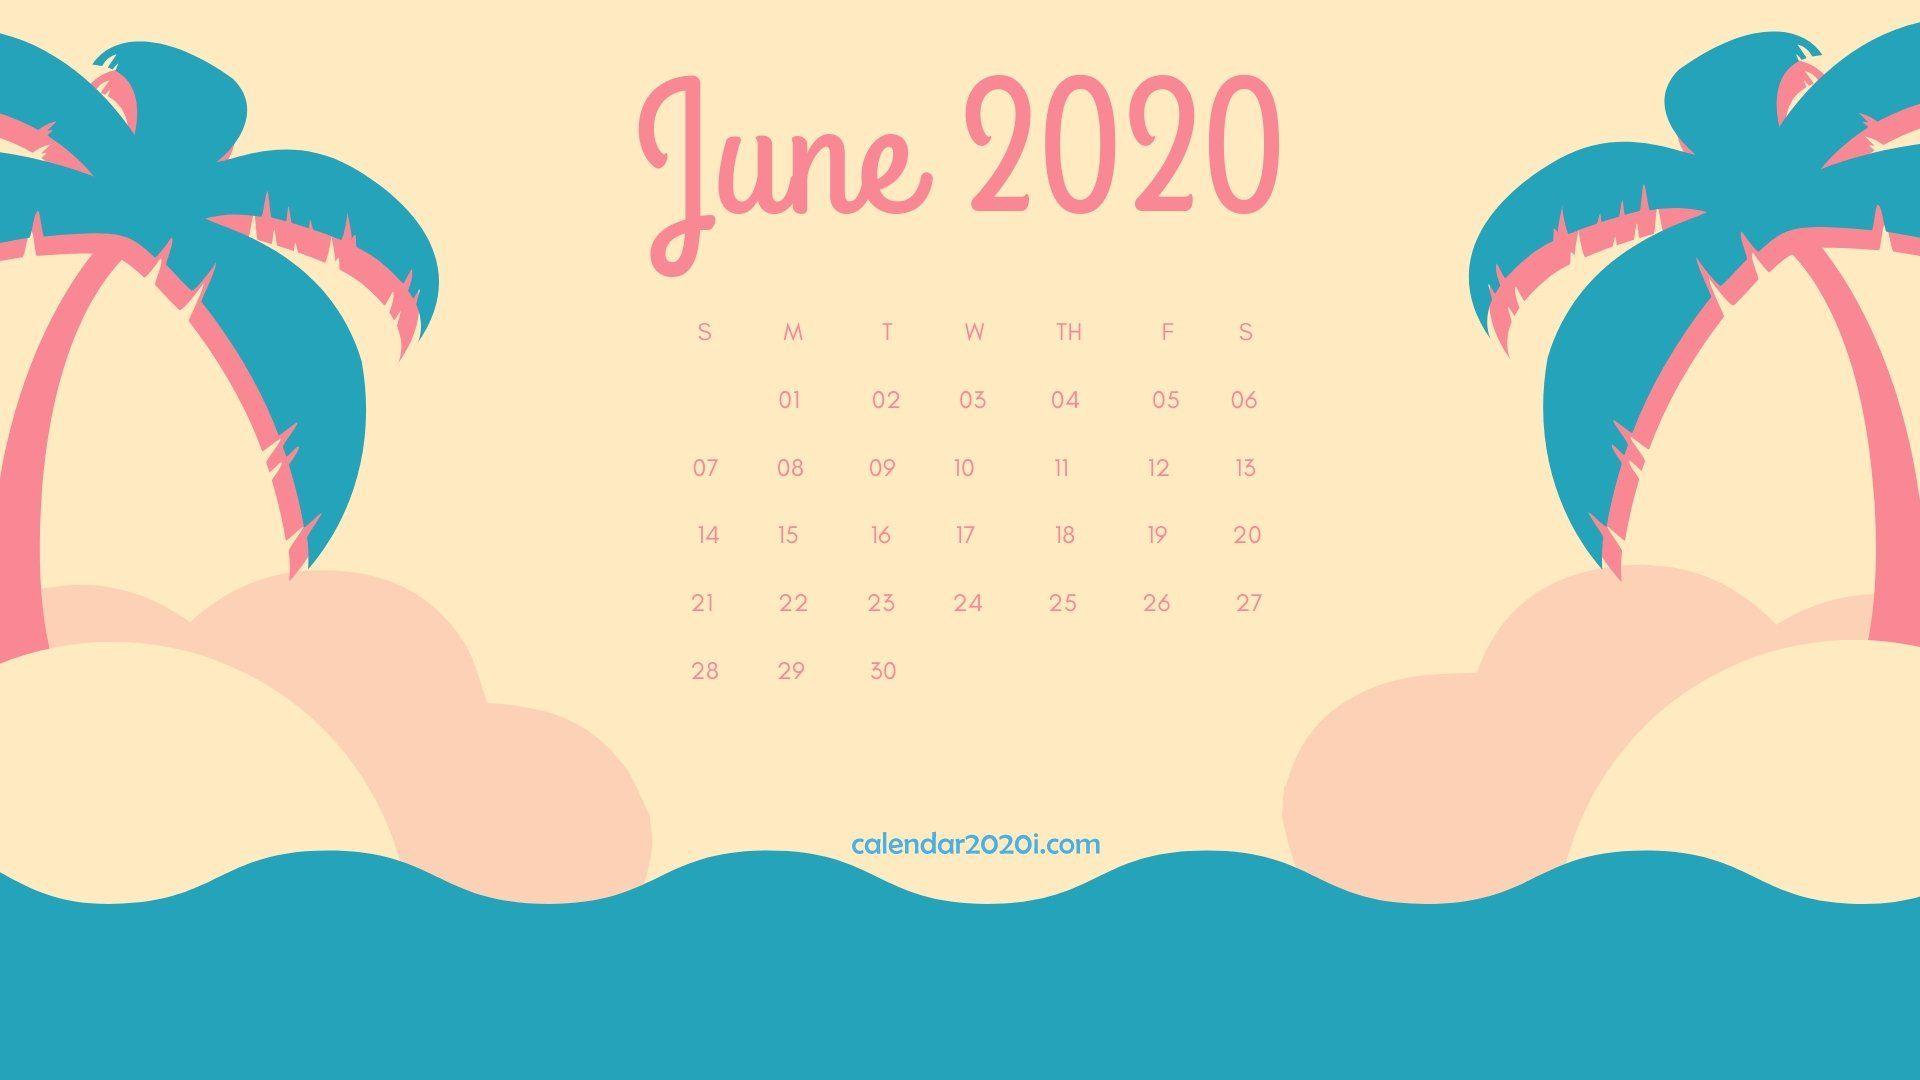 June 2020 Desktop Calendar